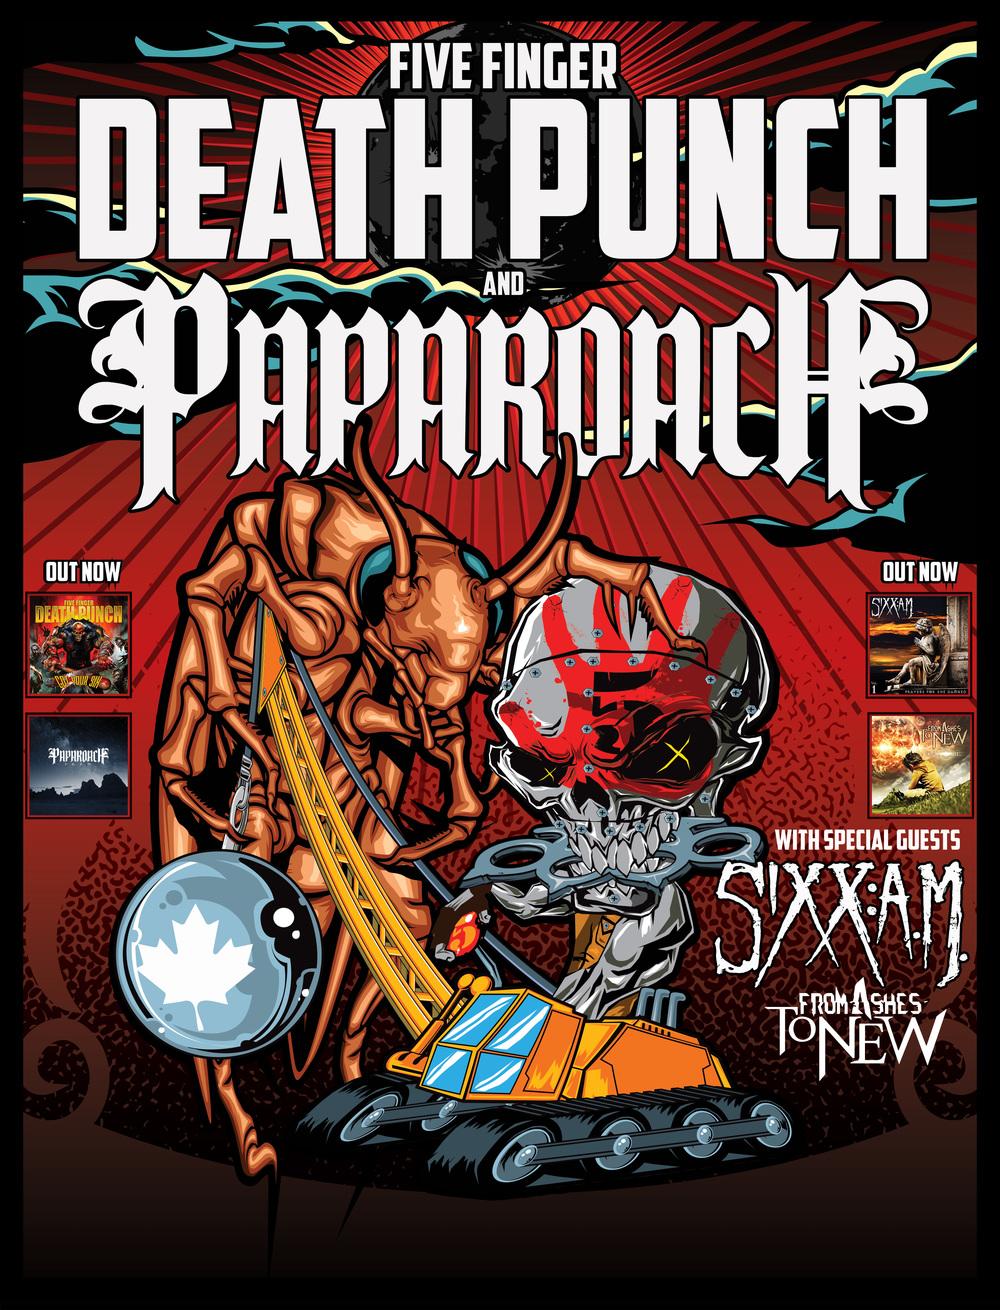 News Papa Roach